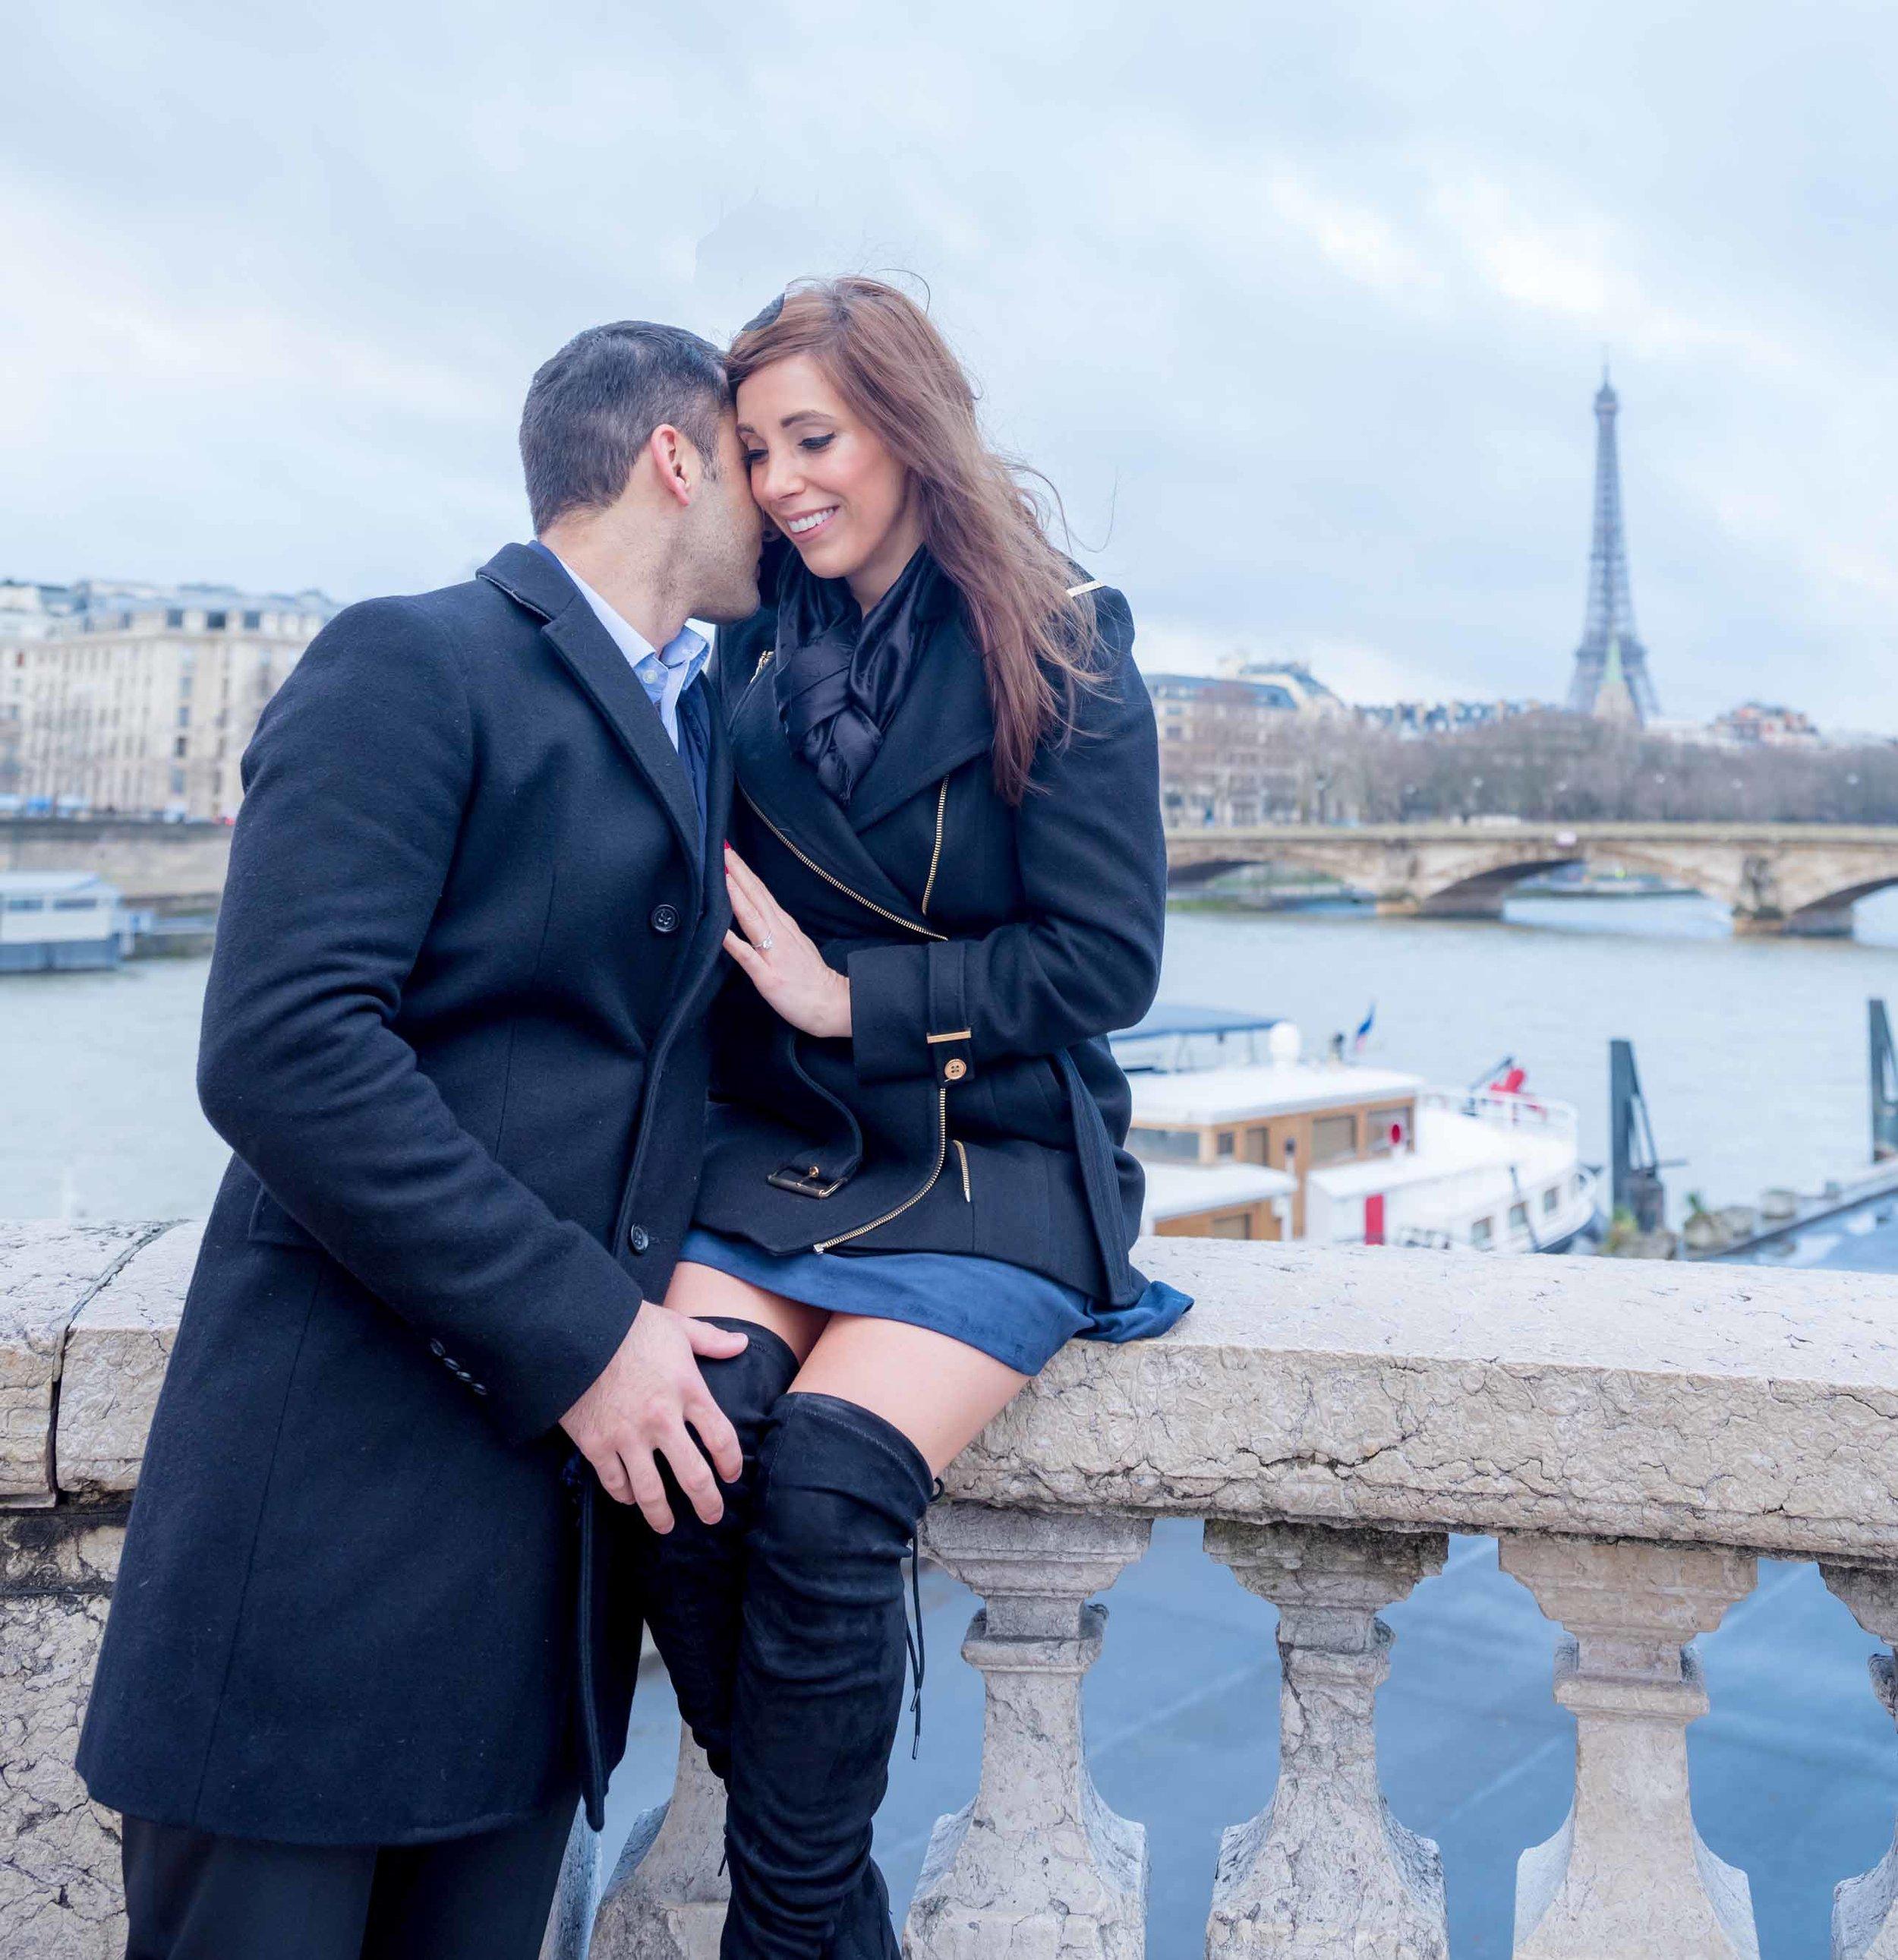 Engagement photo session in dreamy Paris